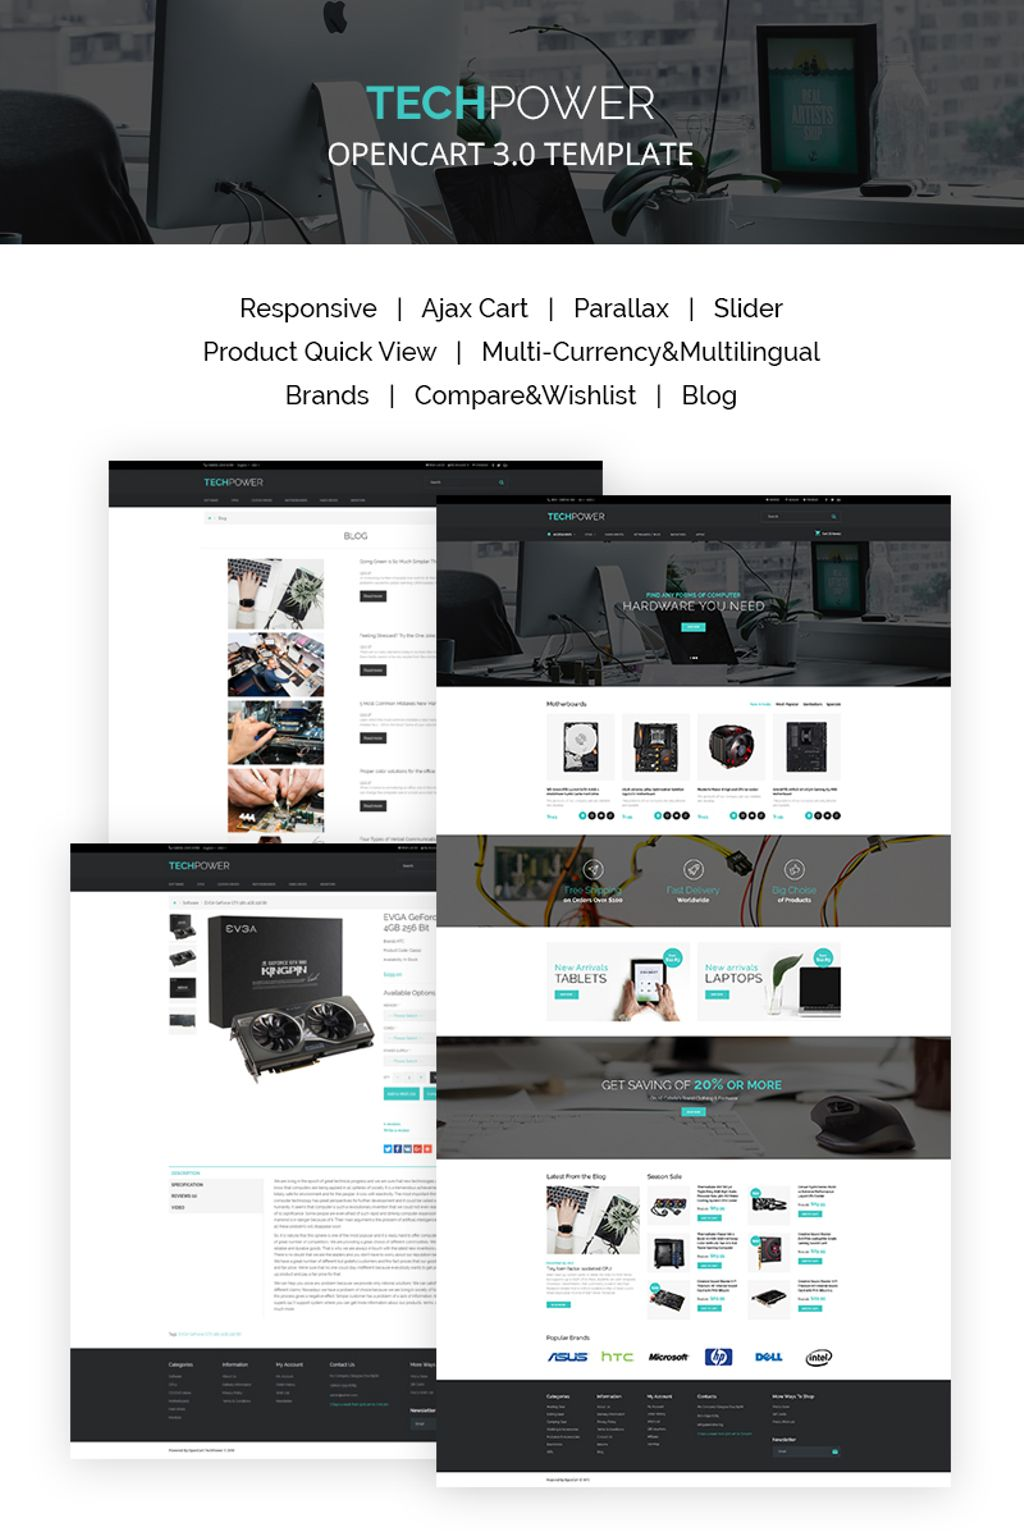 TechPower - Hardware Shop №66882 - скриншот